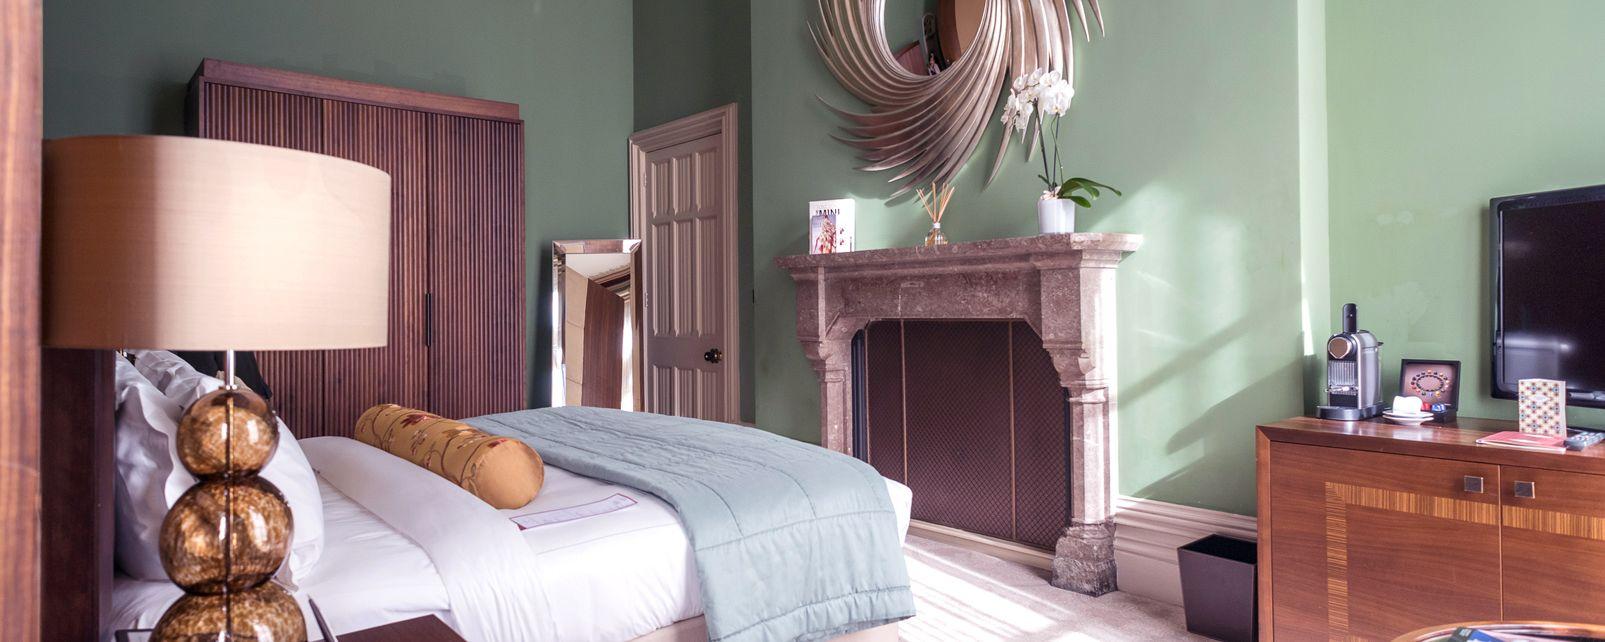 Hotel  St Pancras Renaissance